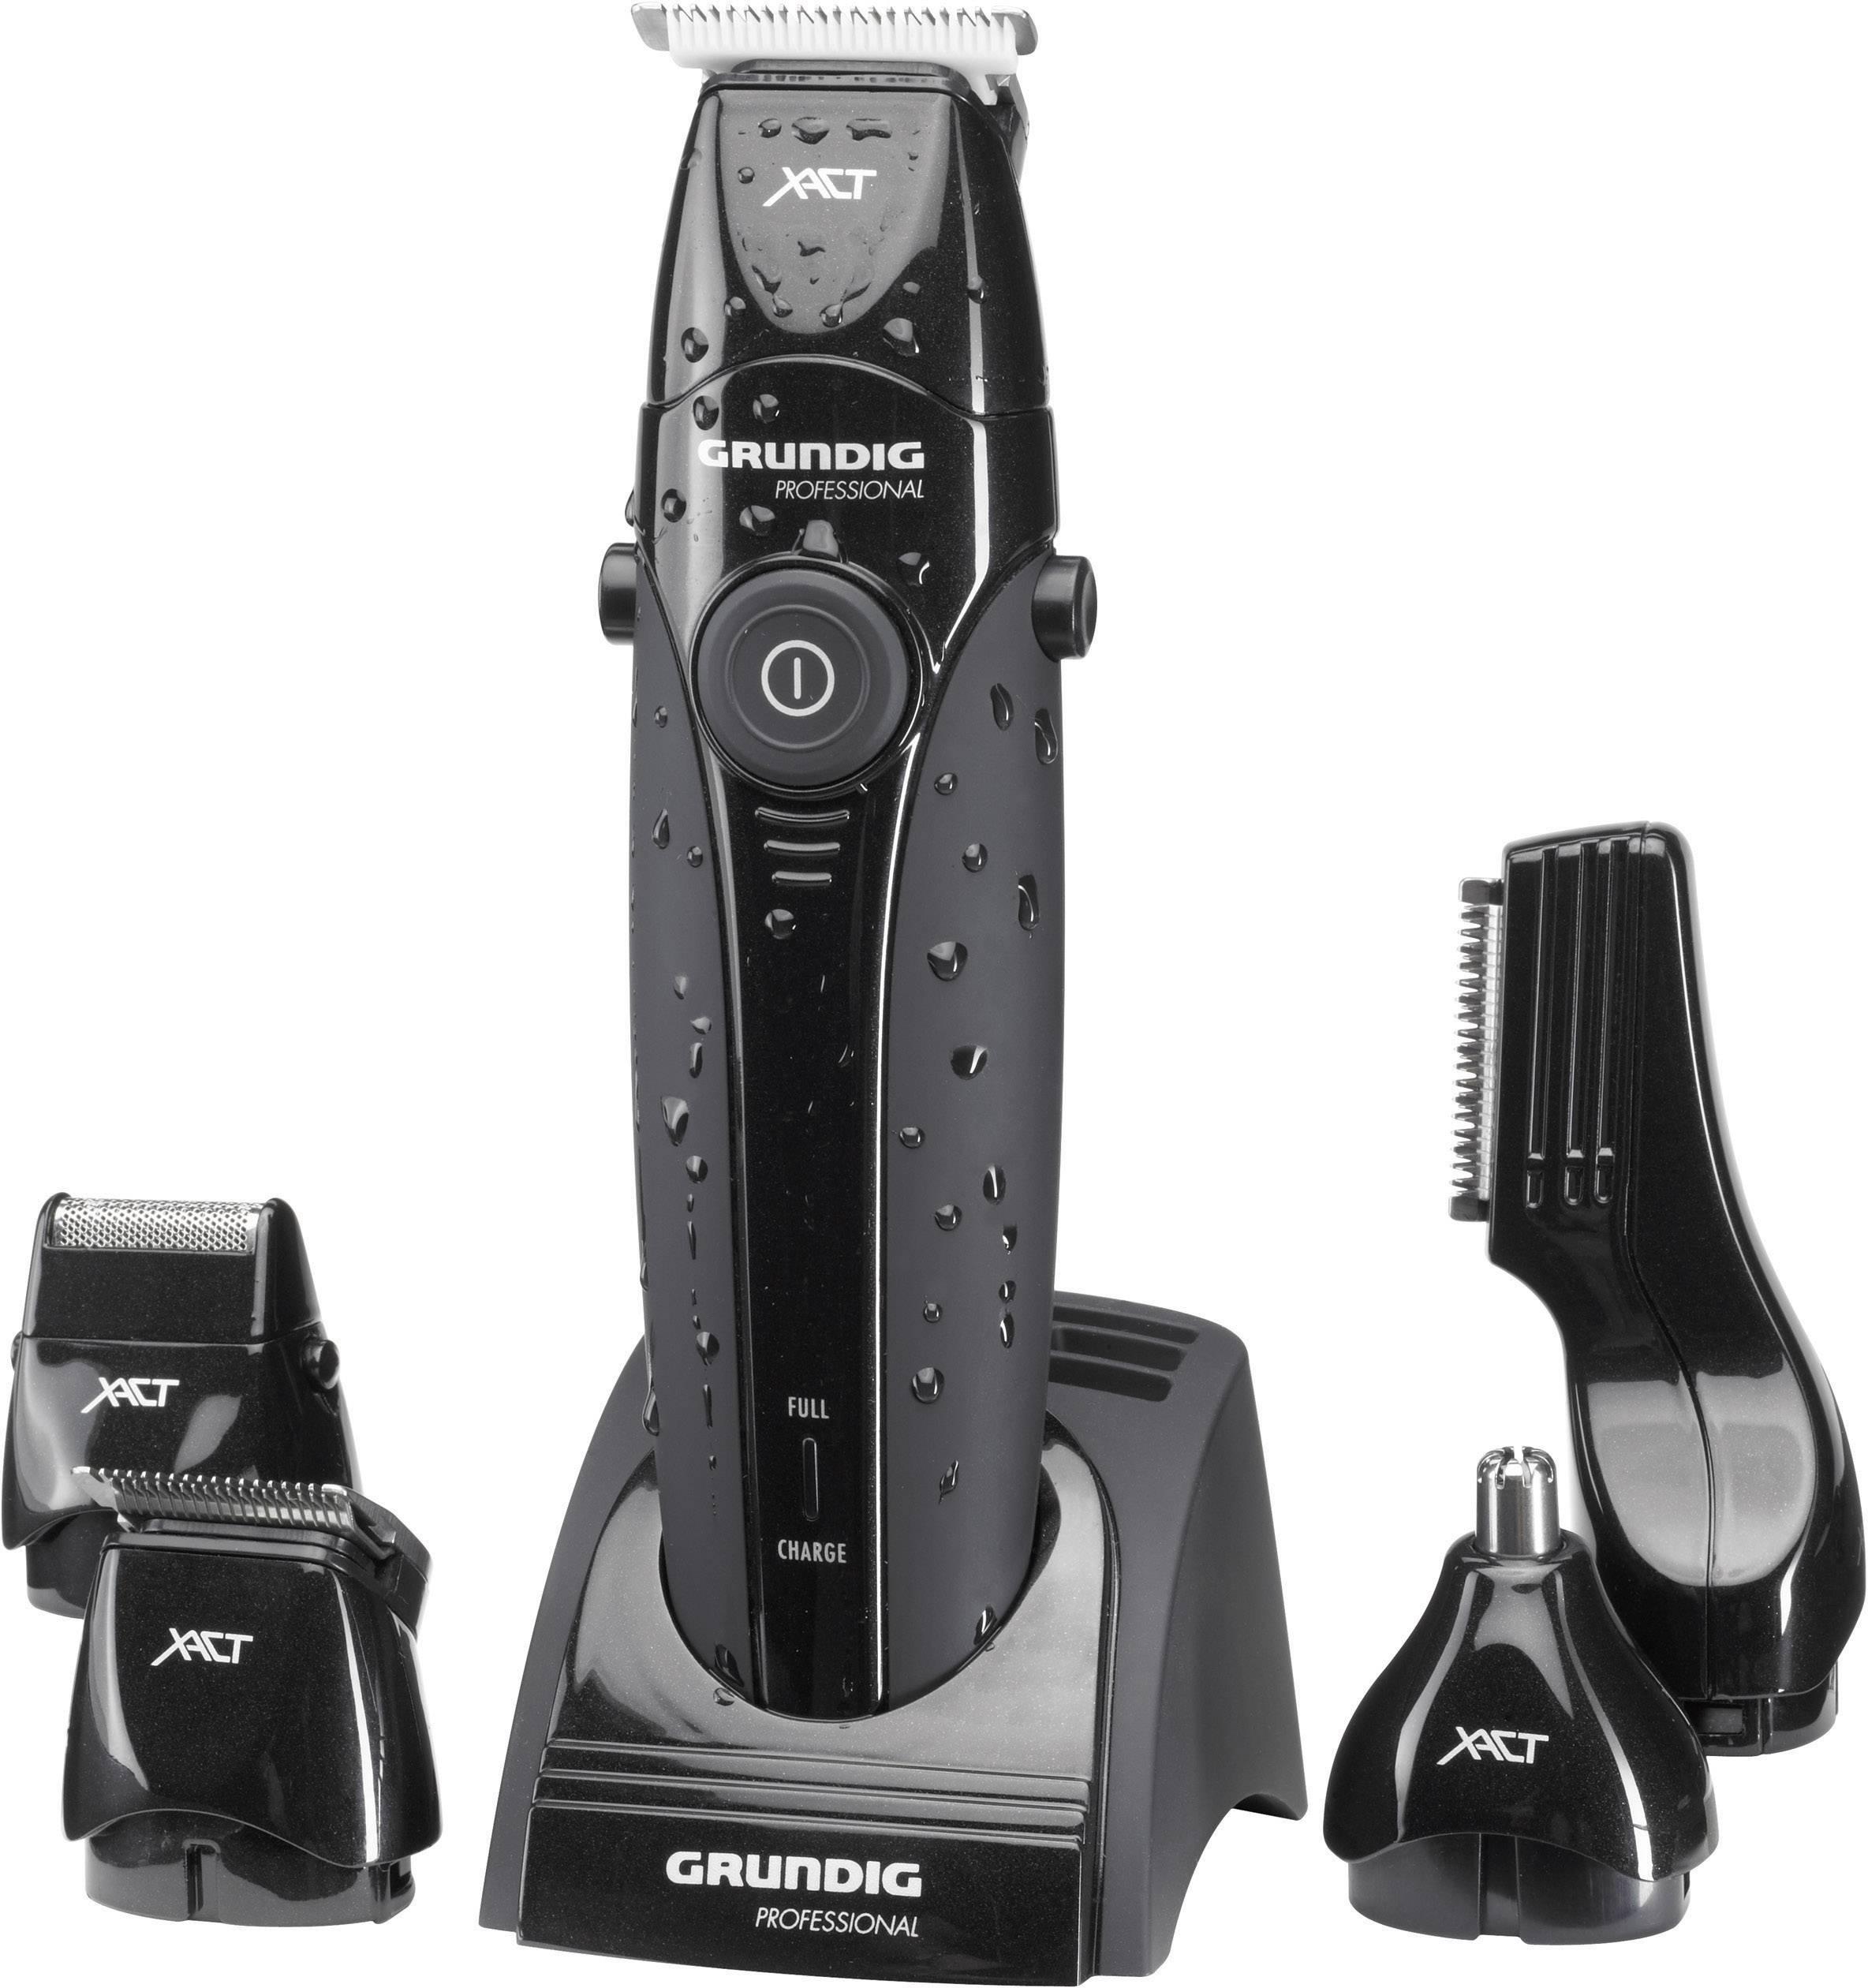 Grundig MT8240 Hair clipper, Beard trimmer, Body hair